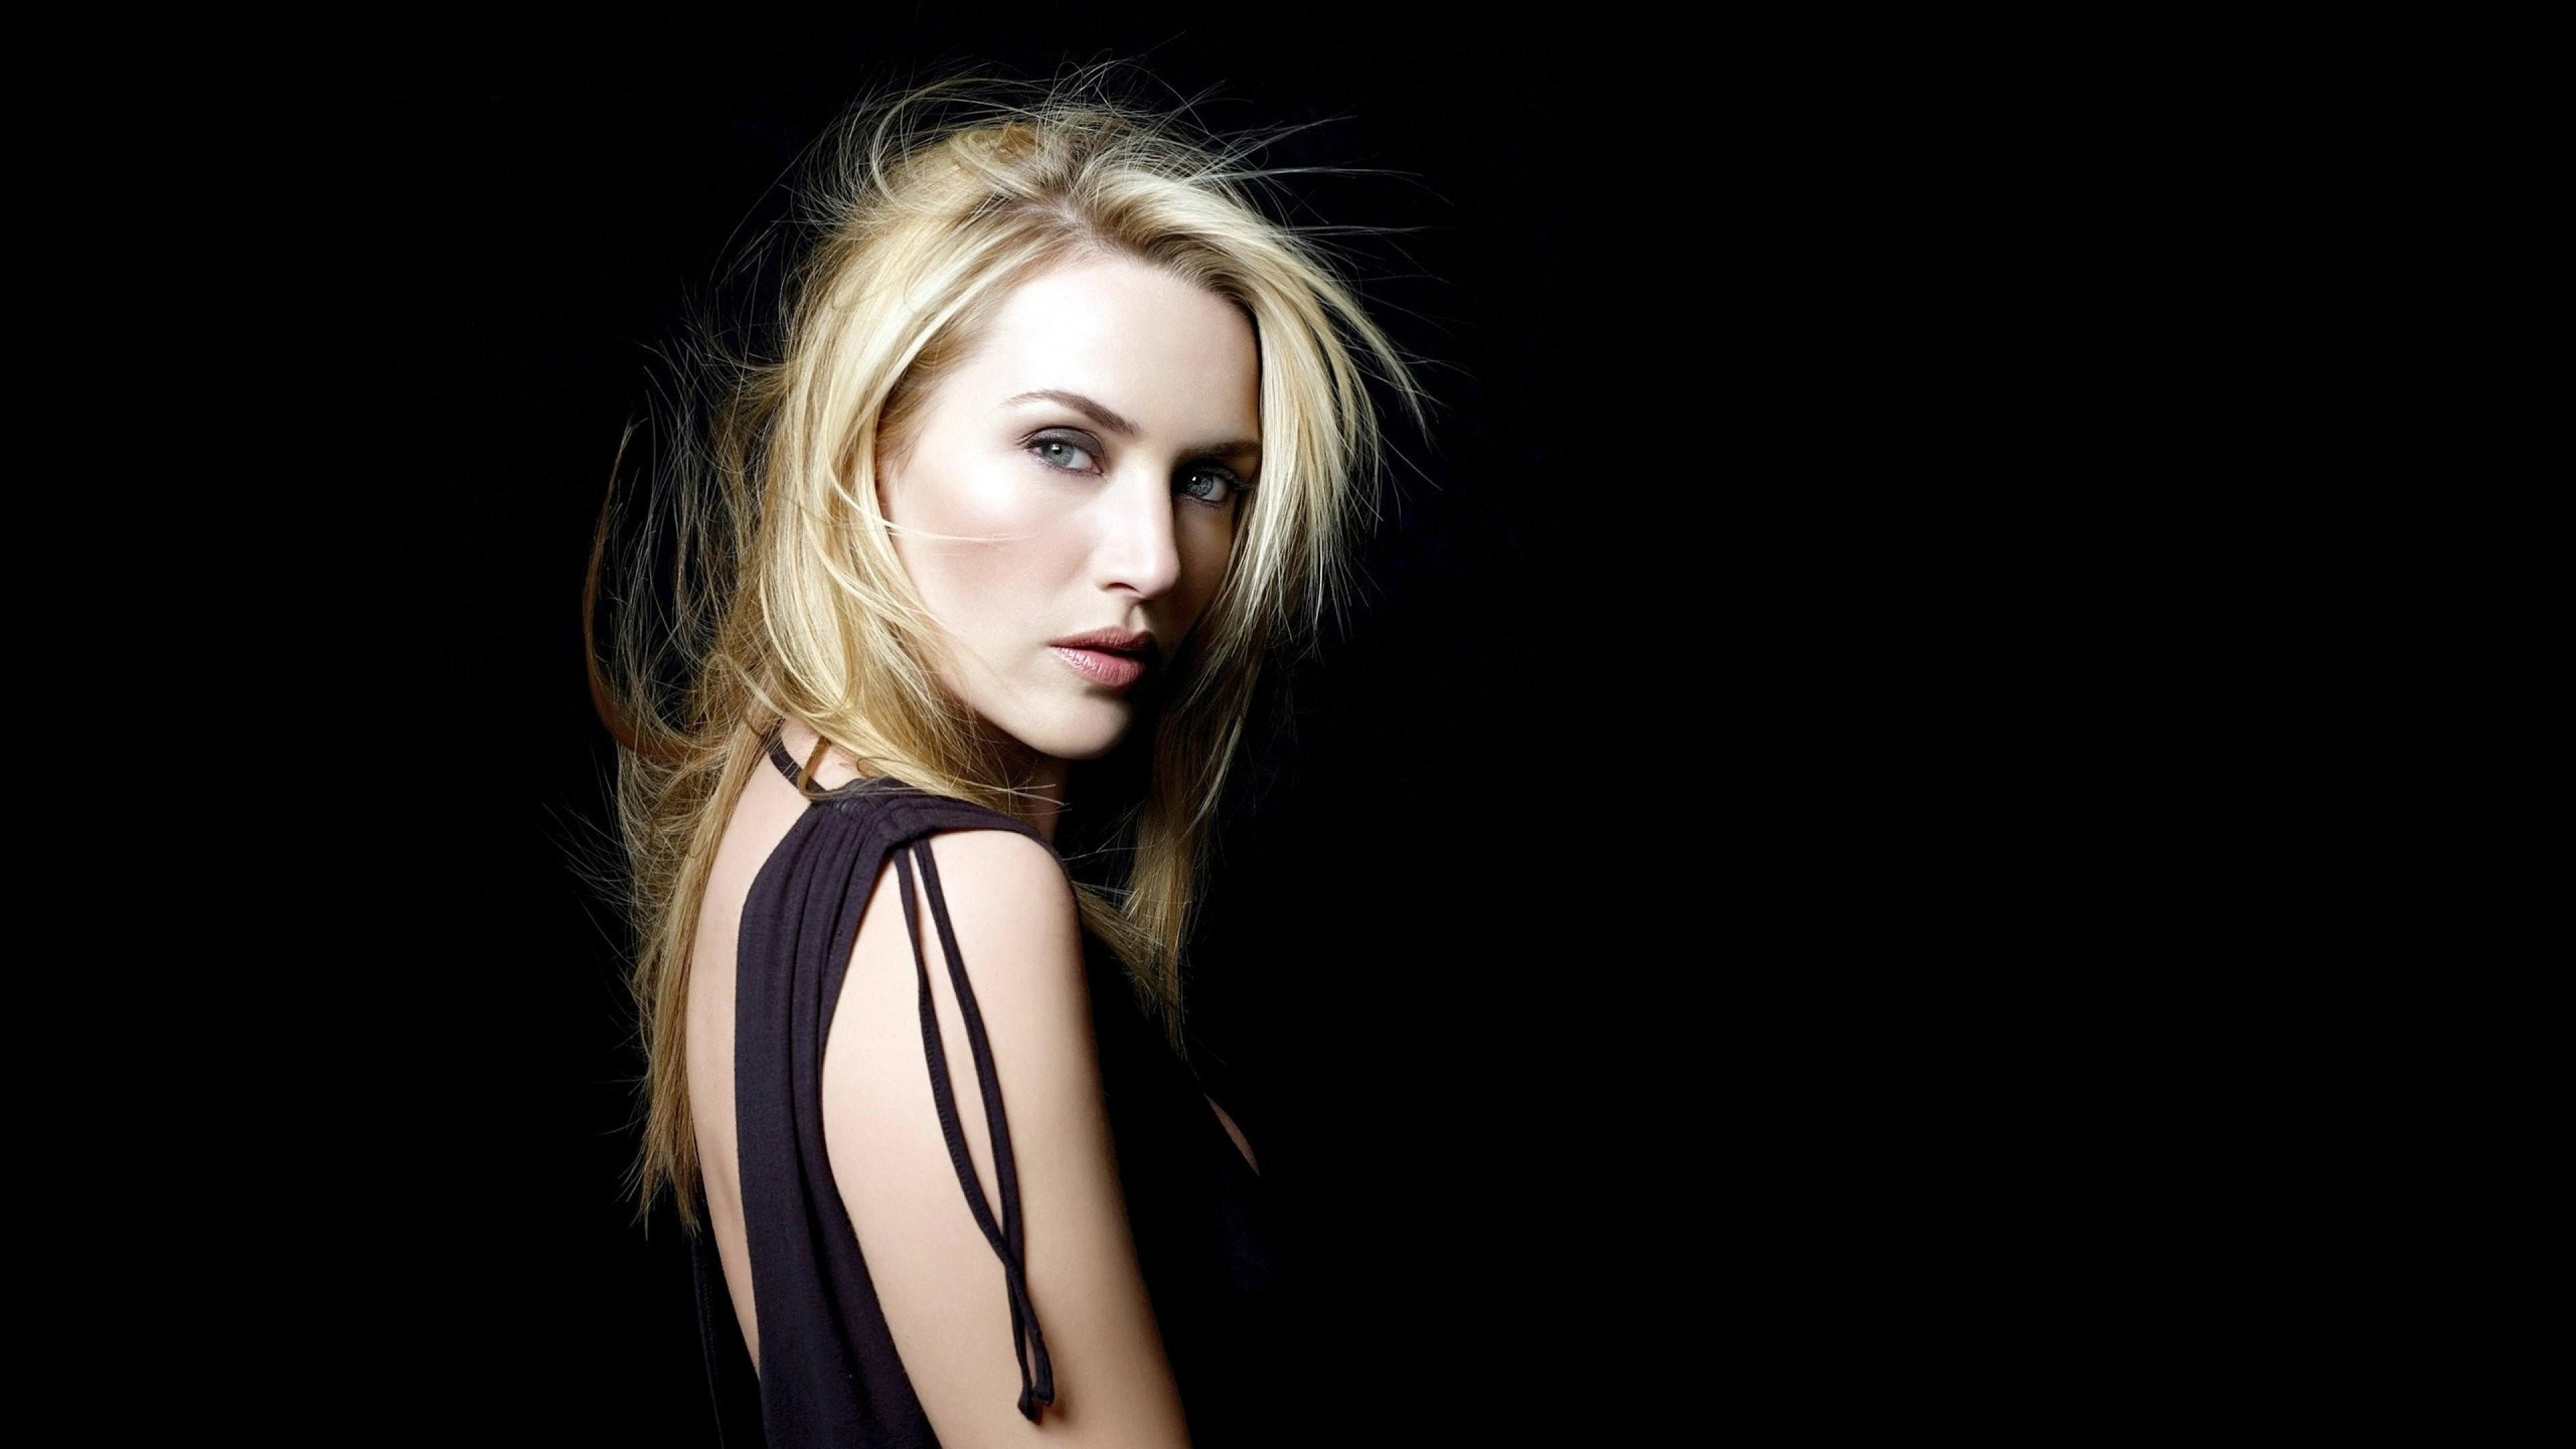 Kate Winslet Blonde Hairs